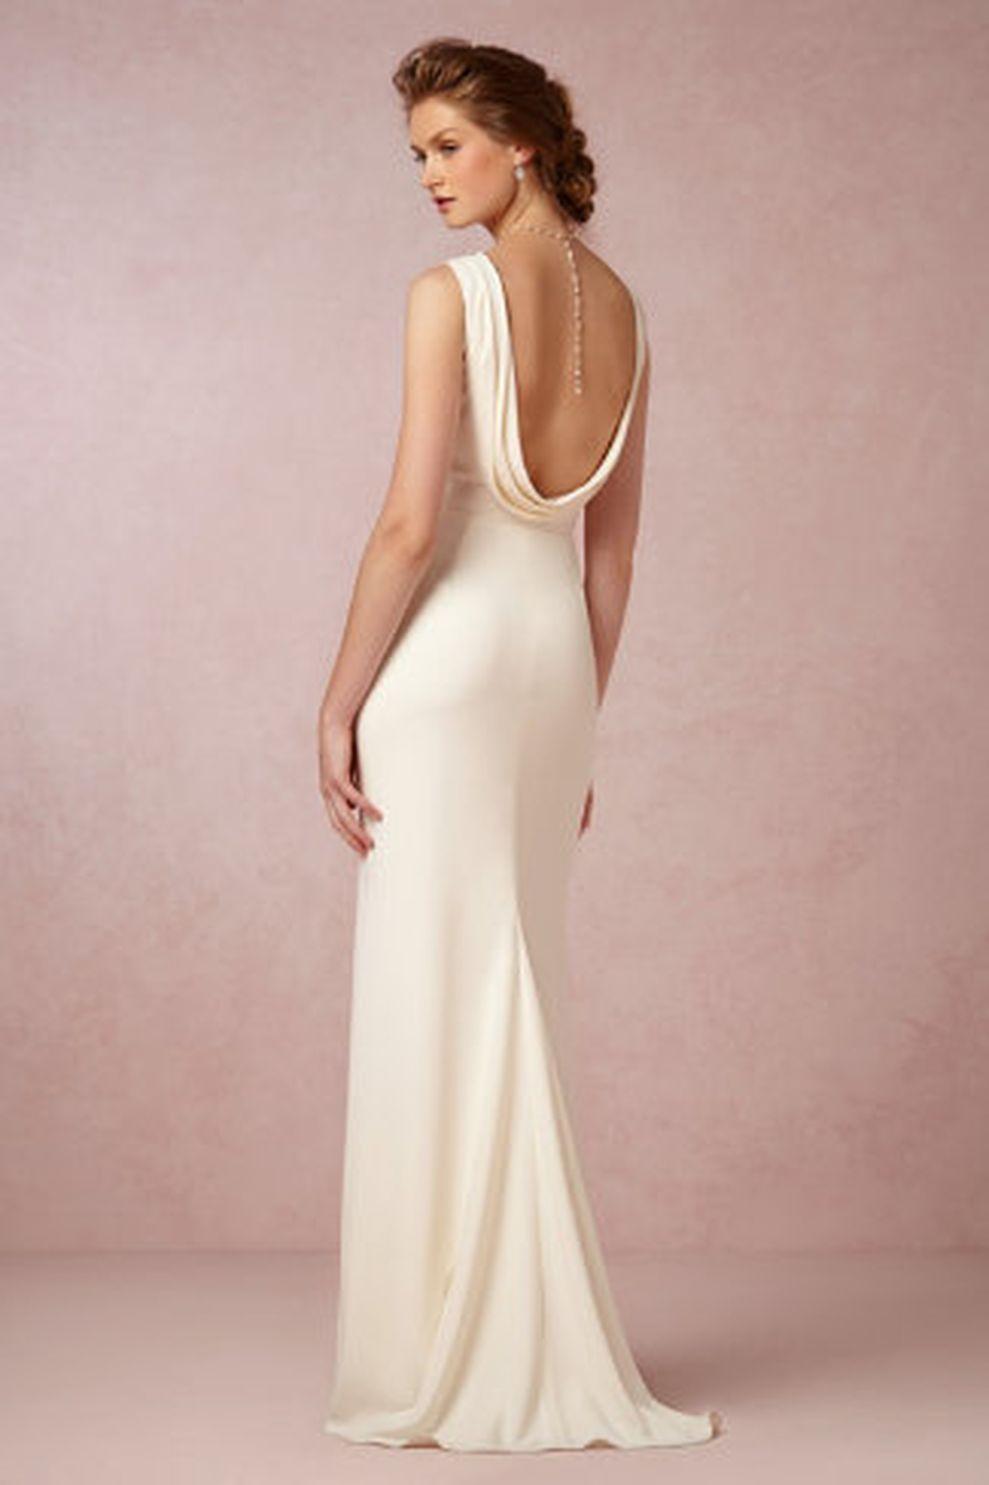 Casual hippie wedding dresses   Elegant Vineyard Wedding Dresses Ideas Perfect for Casual